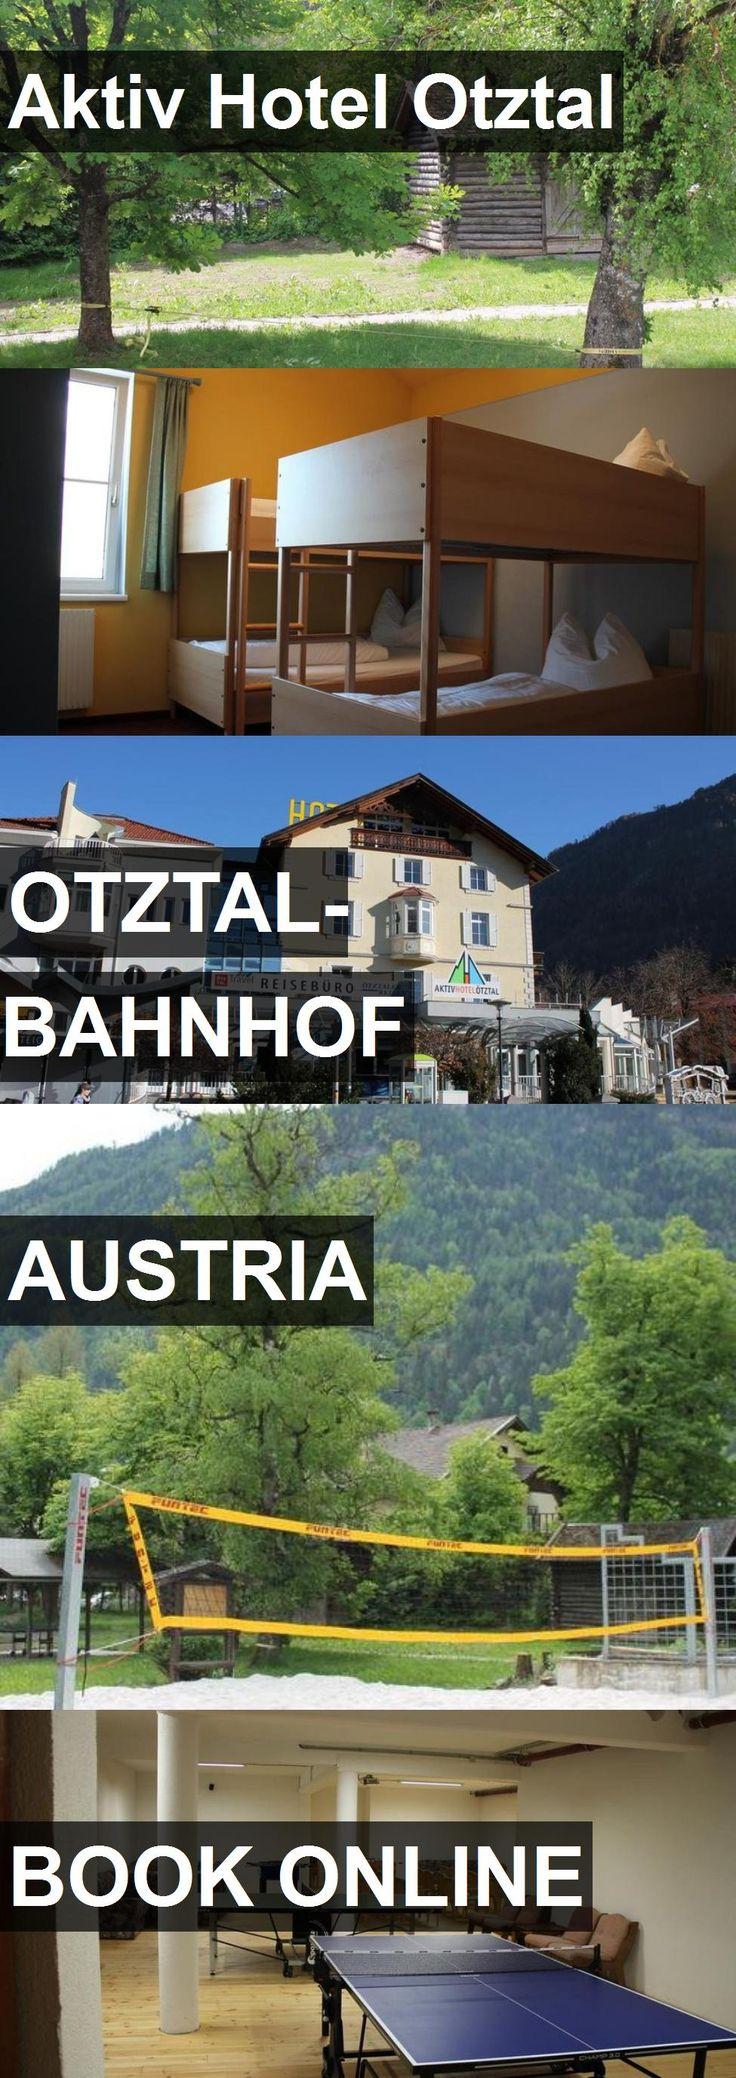 Aktiv Hotel Otztal in Otztal-Bahnhof, Austria. For more information, photos, reviews and best prices please follow the link. #Austria #Otztal-Bahnhof #travel #vacation #hotel